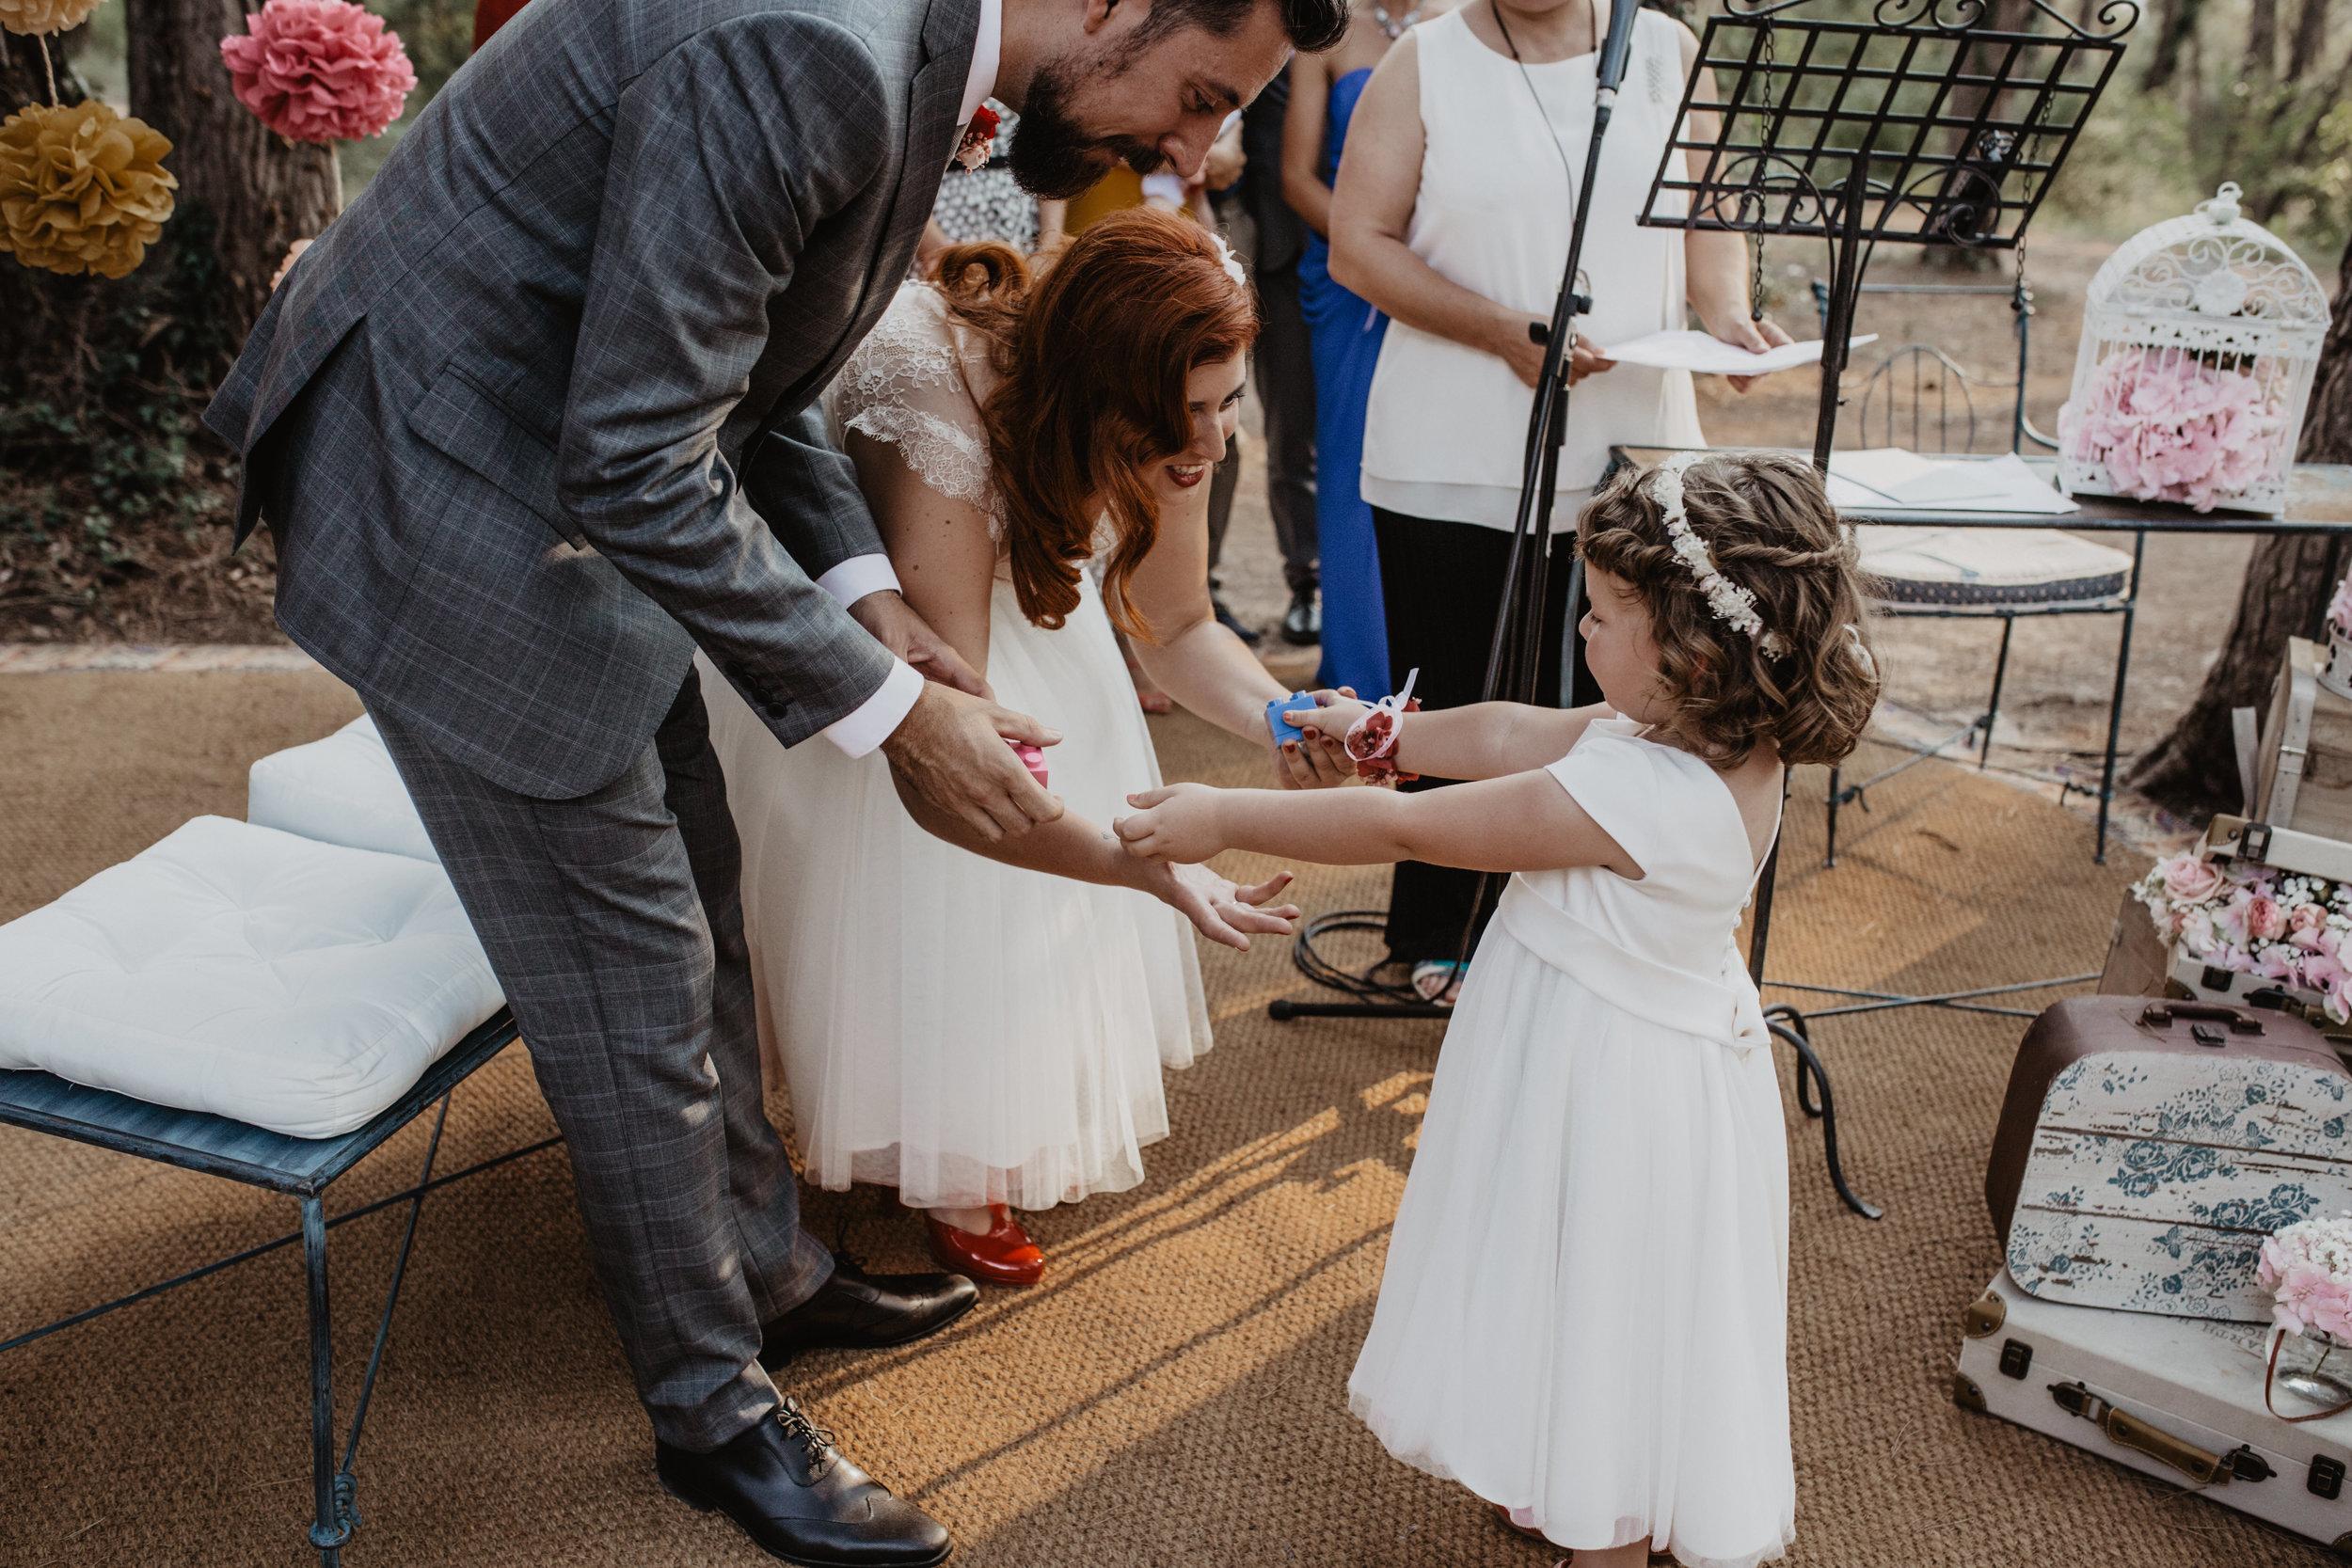 thenortherngirlphotography_photography_thenortherngirl_rebeccascabros_wedding_weddingphotography_masialagarrigadecastelladral_joaniemma_bodaenbarcelona_weddingphotographer_emmaijoan-378.jpg